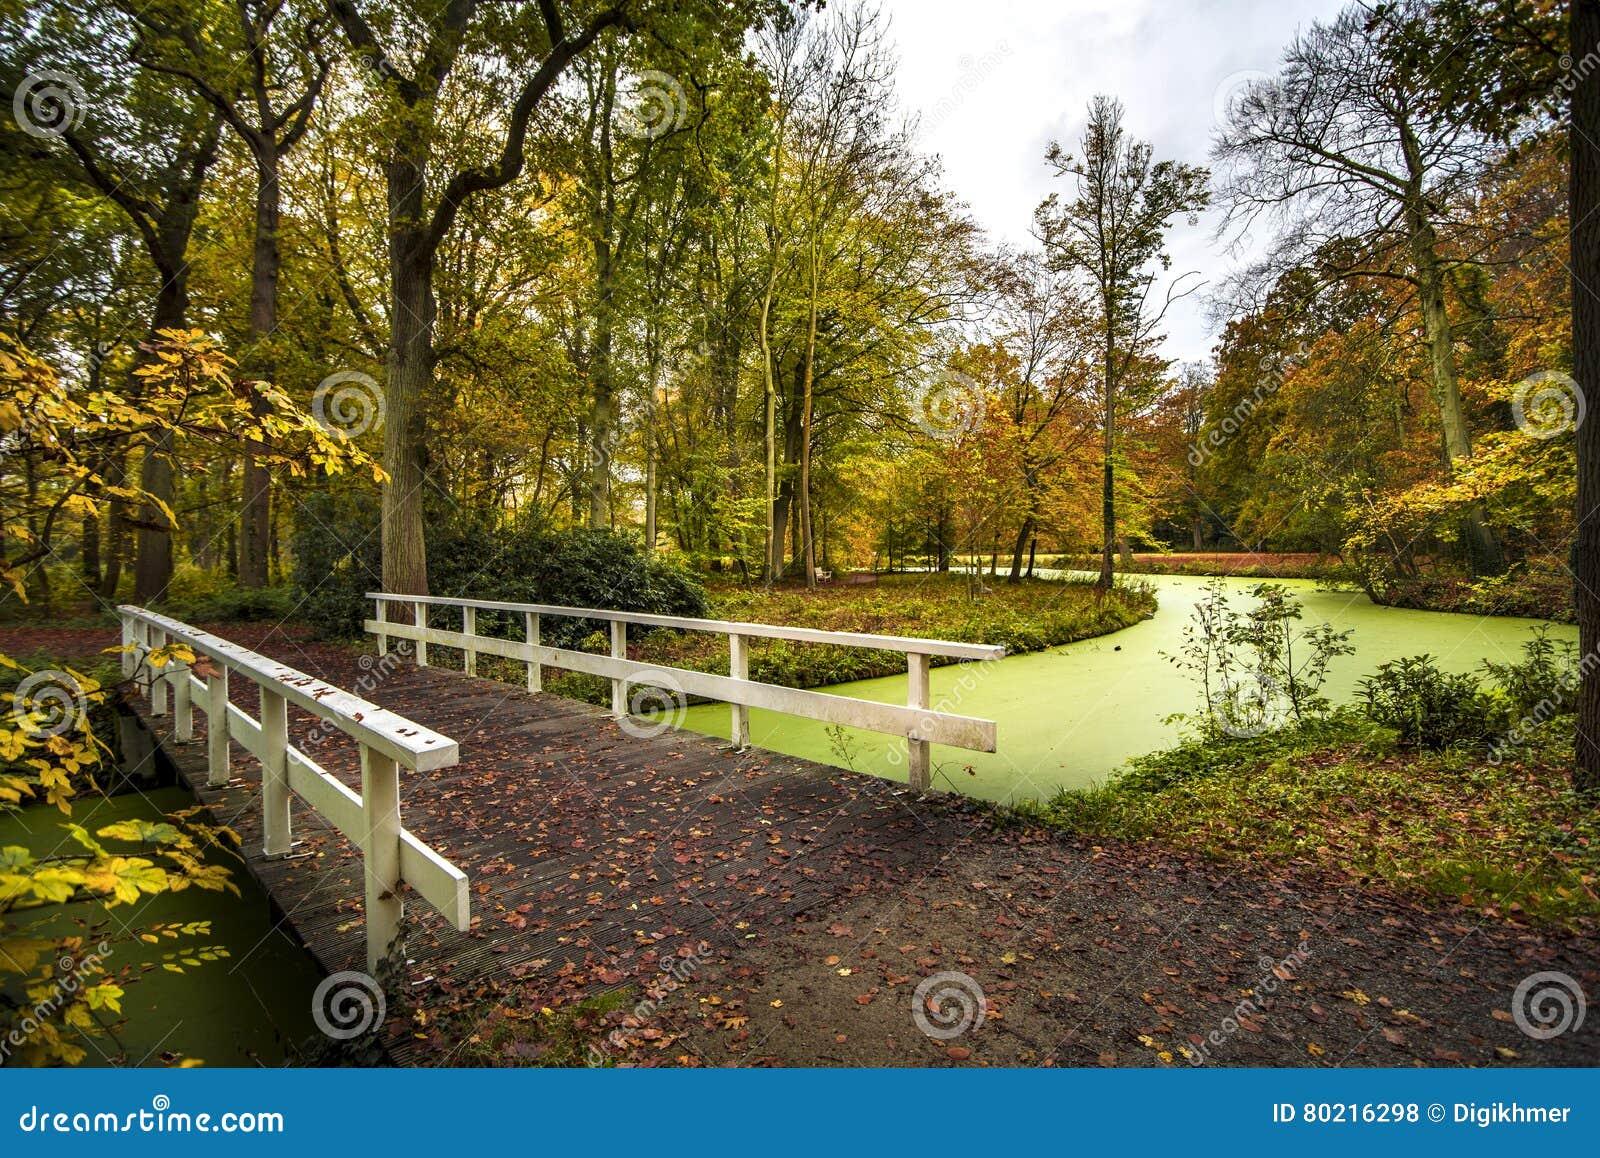 Ponte olandese del paese in autunno